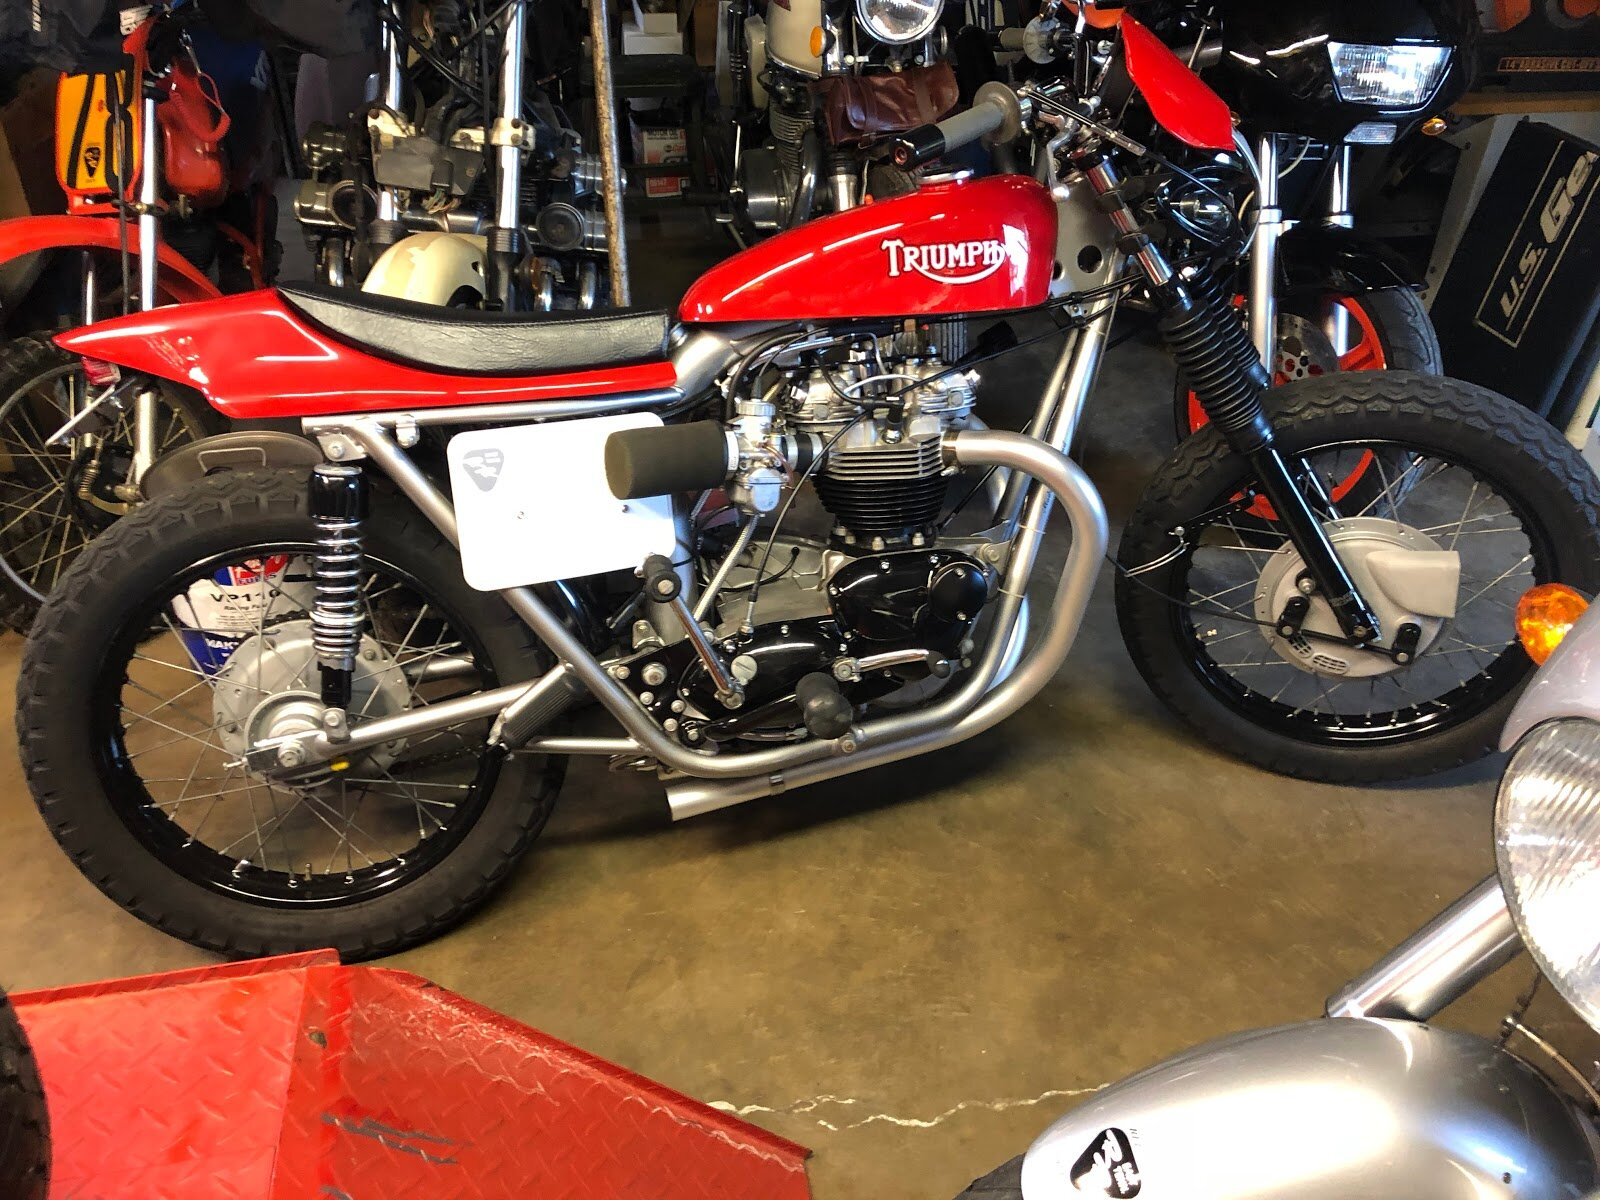 Randy's T120 Triumph